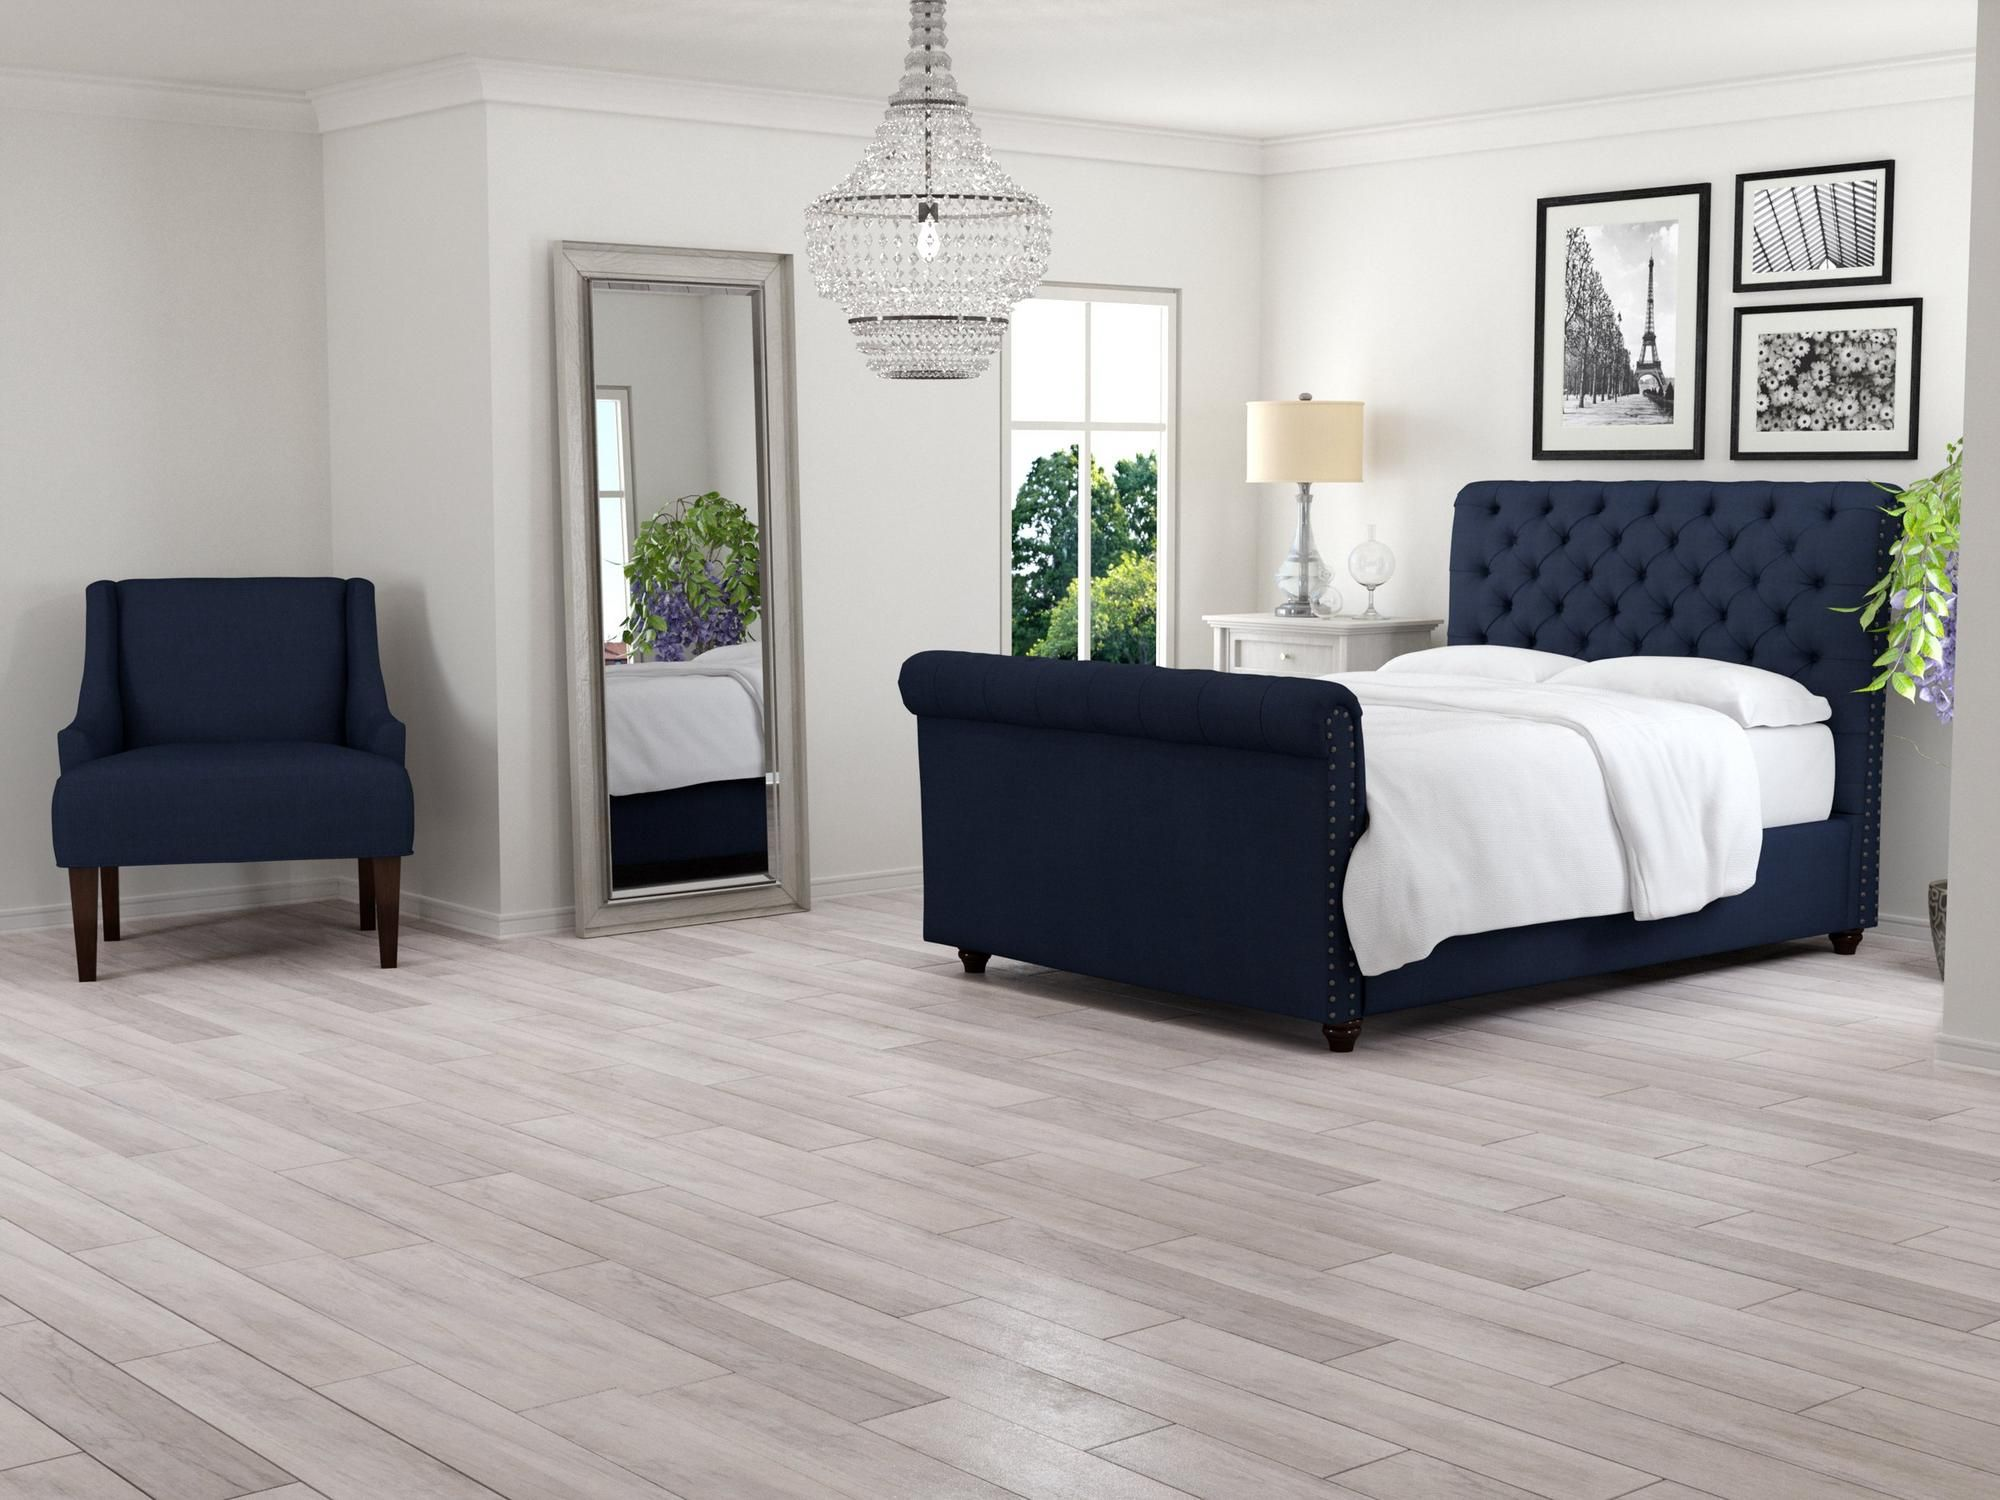 Valkiria Marfil Wood Plank Porcelain Tile  Floor & Decor  Floor